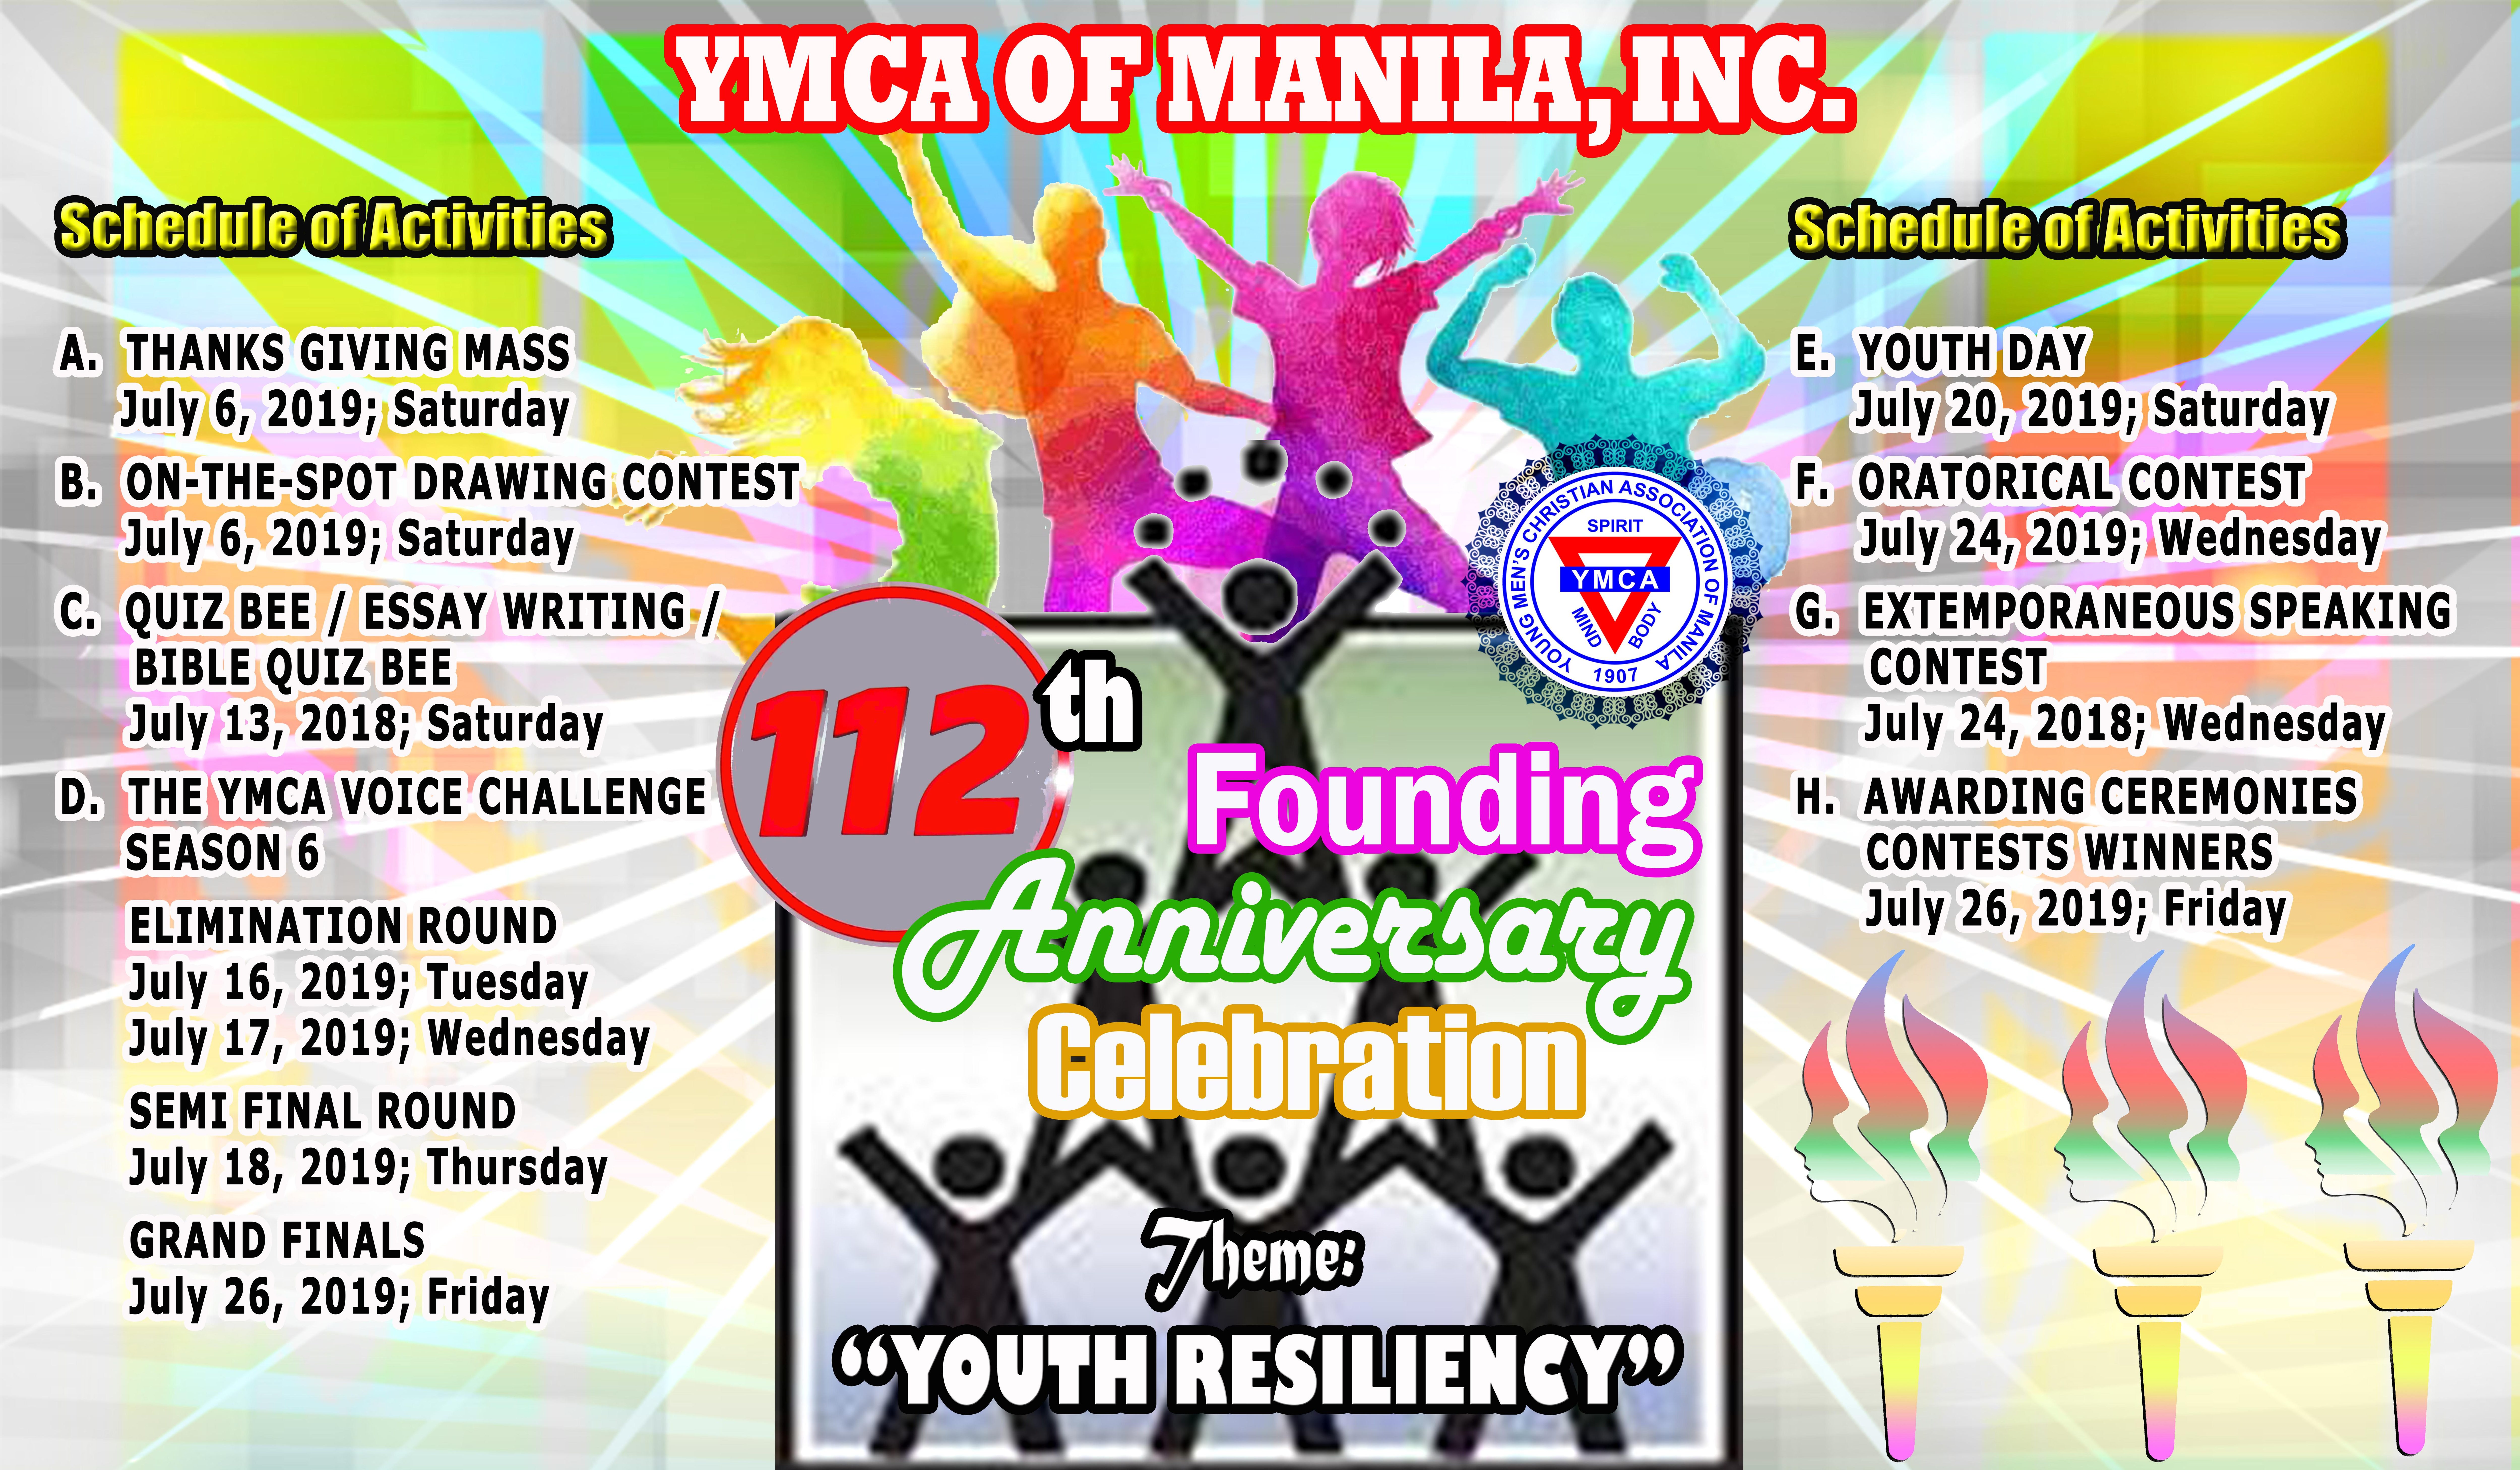 YMCA of Manila, Inc